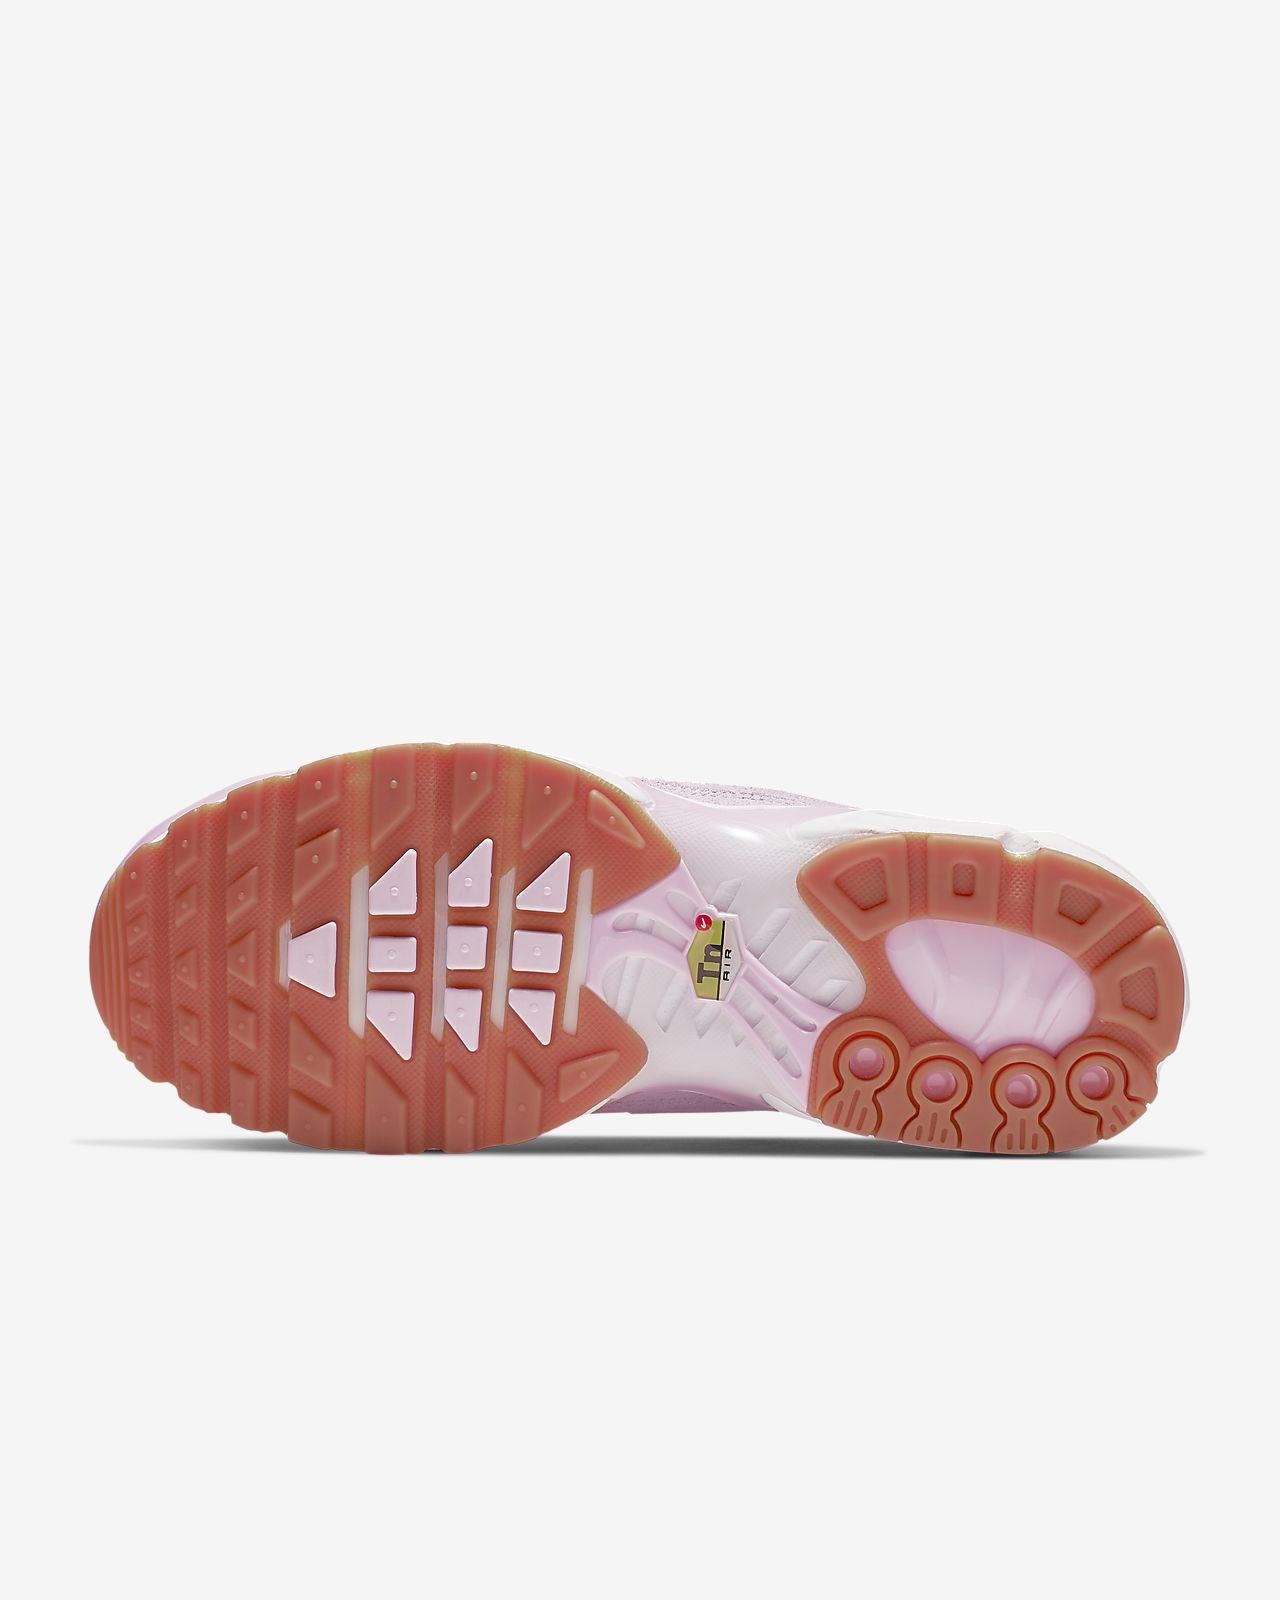 Nike Air Max Plus Premium női cipő